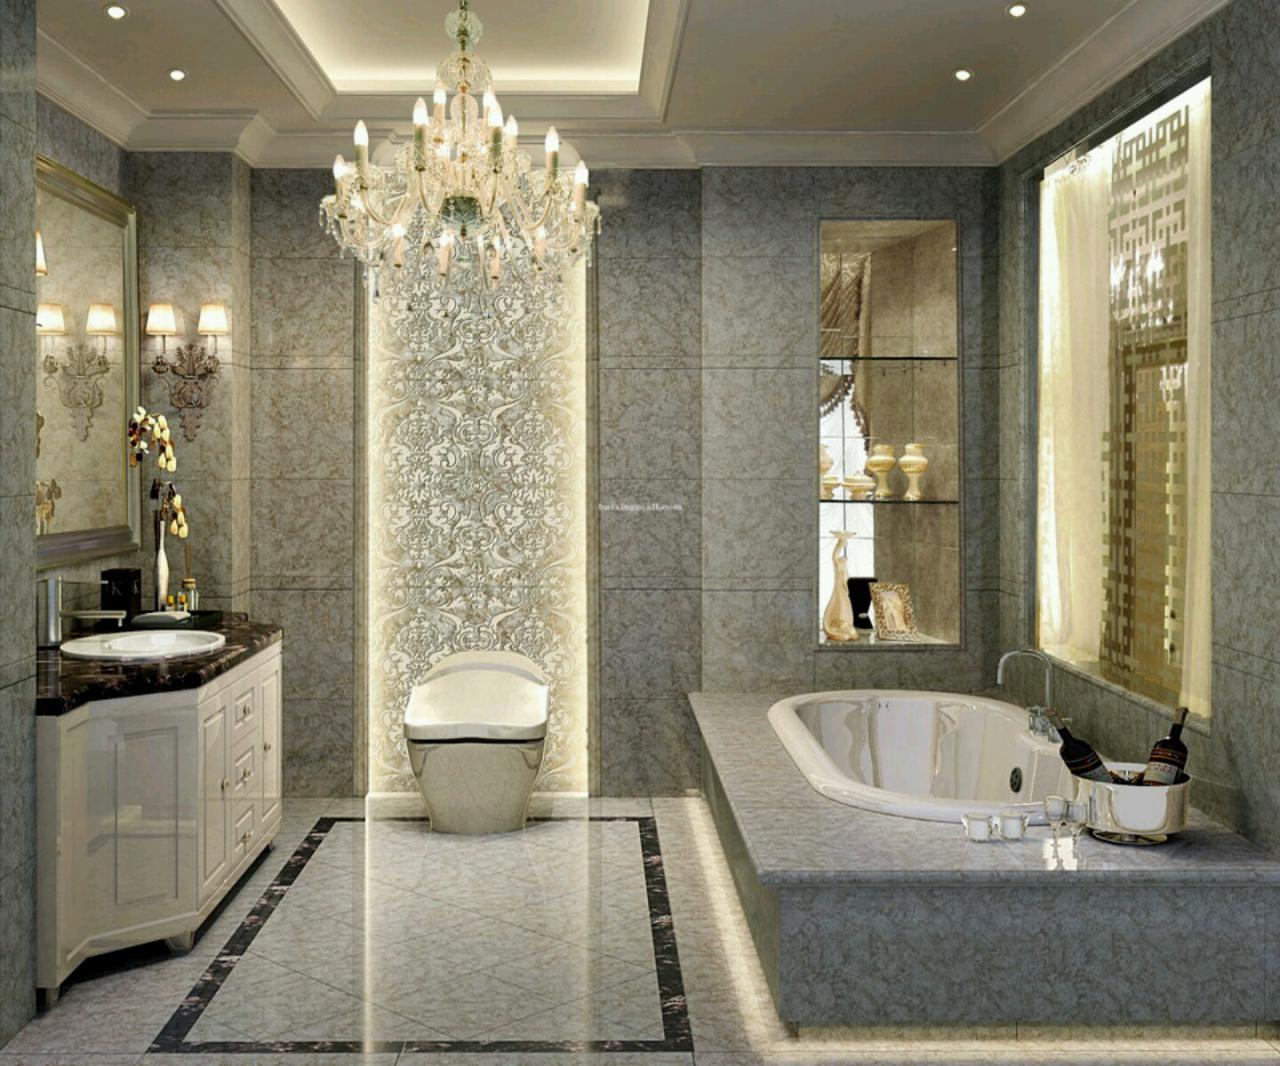 Luxury bathrooms designs.